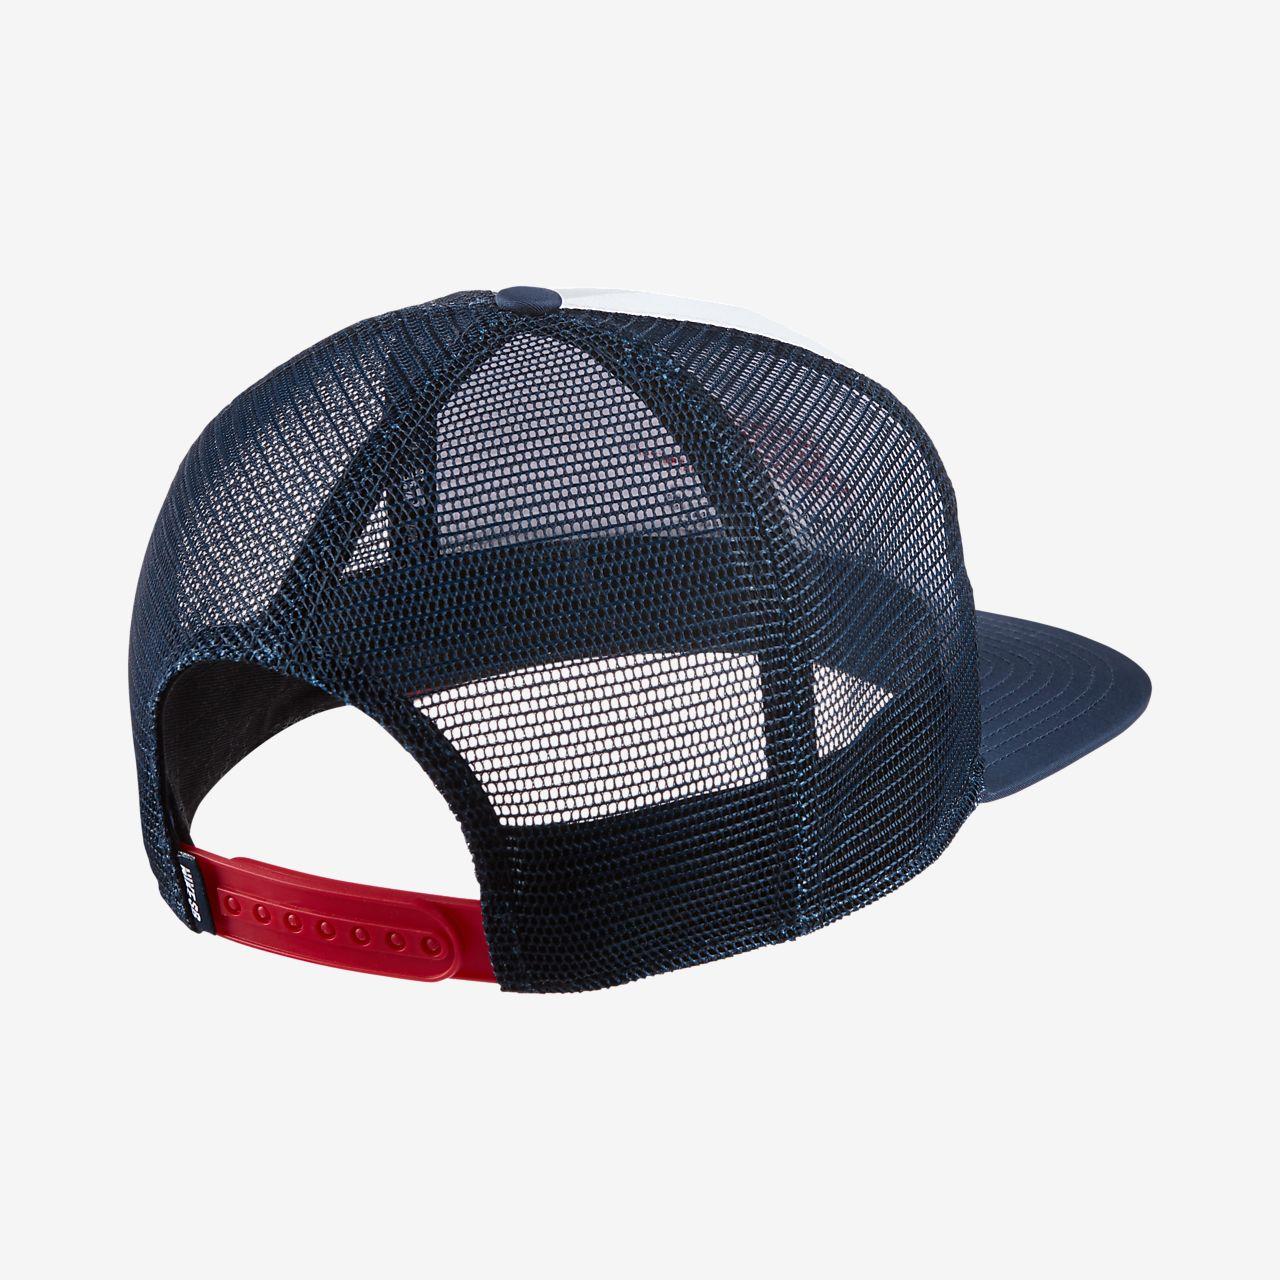 a7070563c8851 Nike SB Trucker Adjustable Hat. Nike.com ID